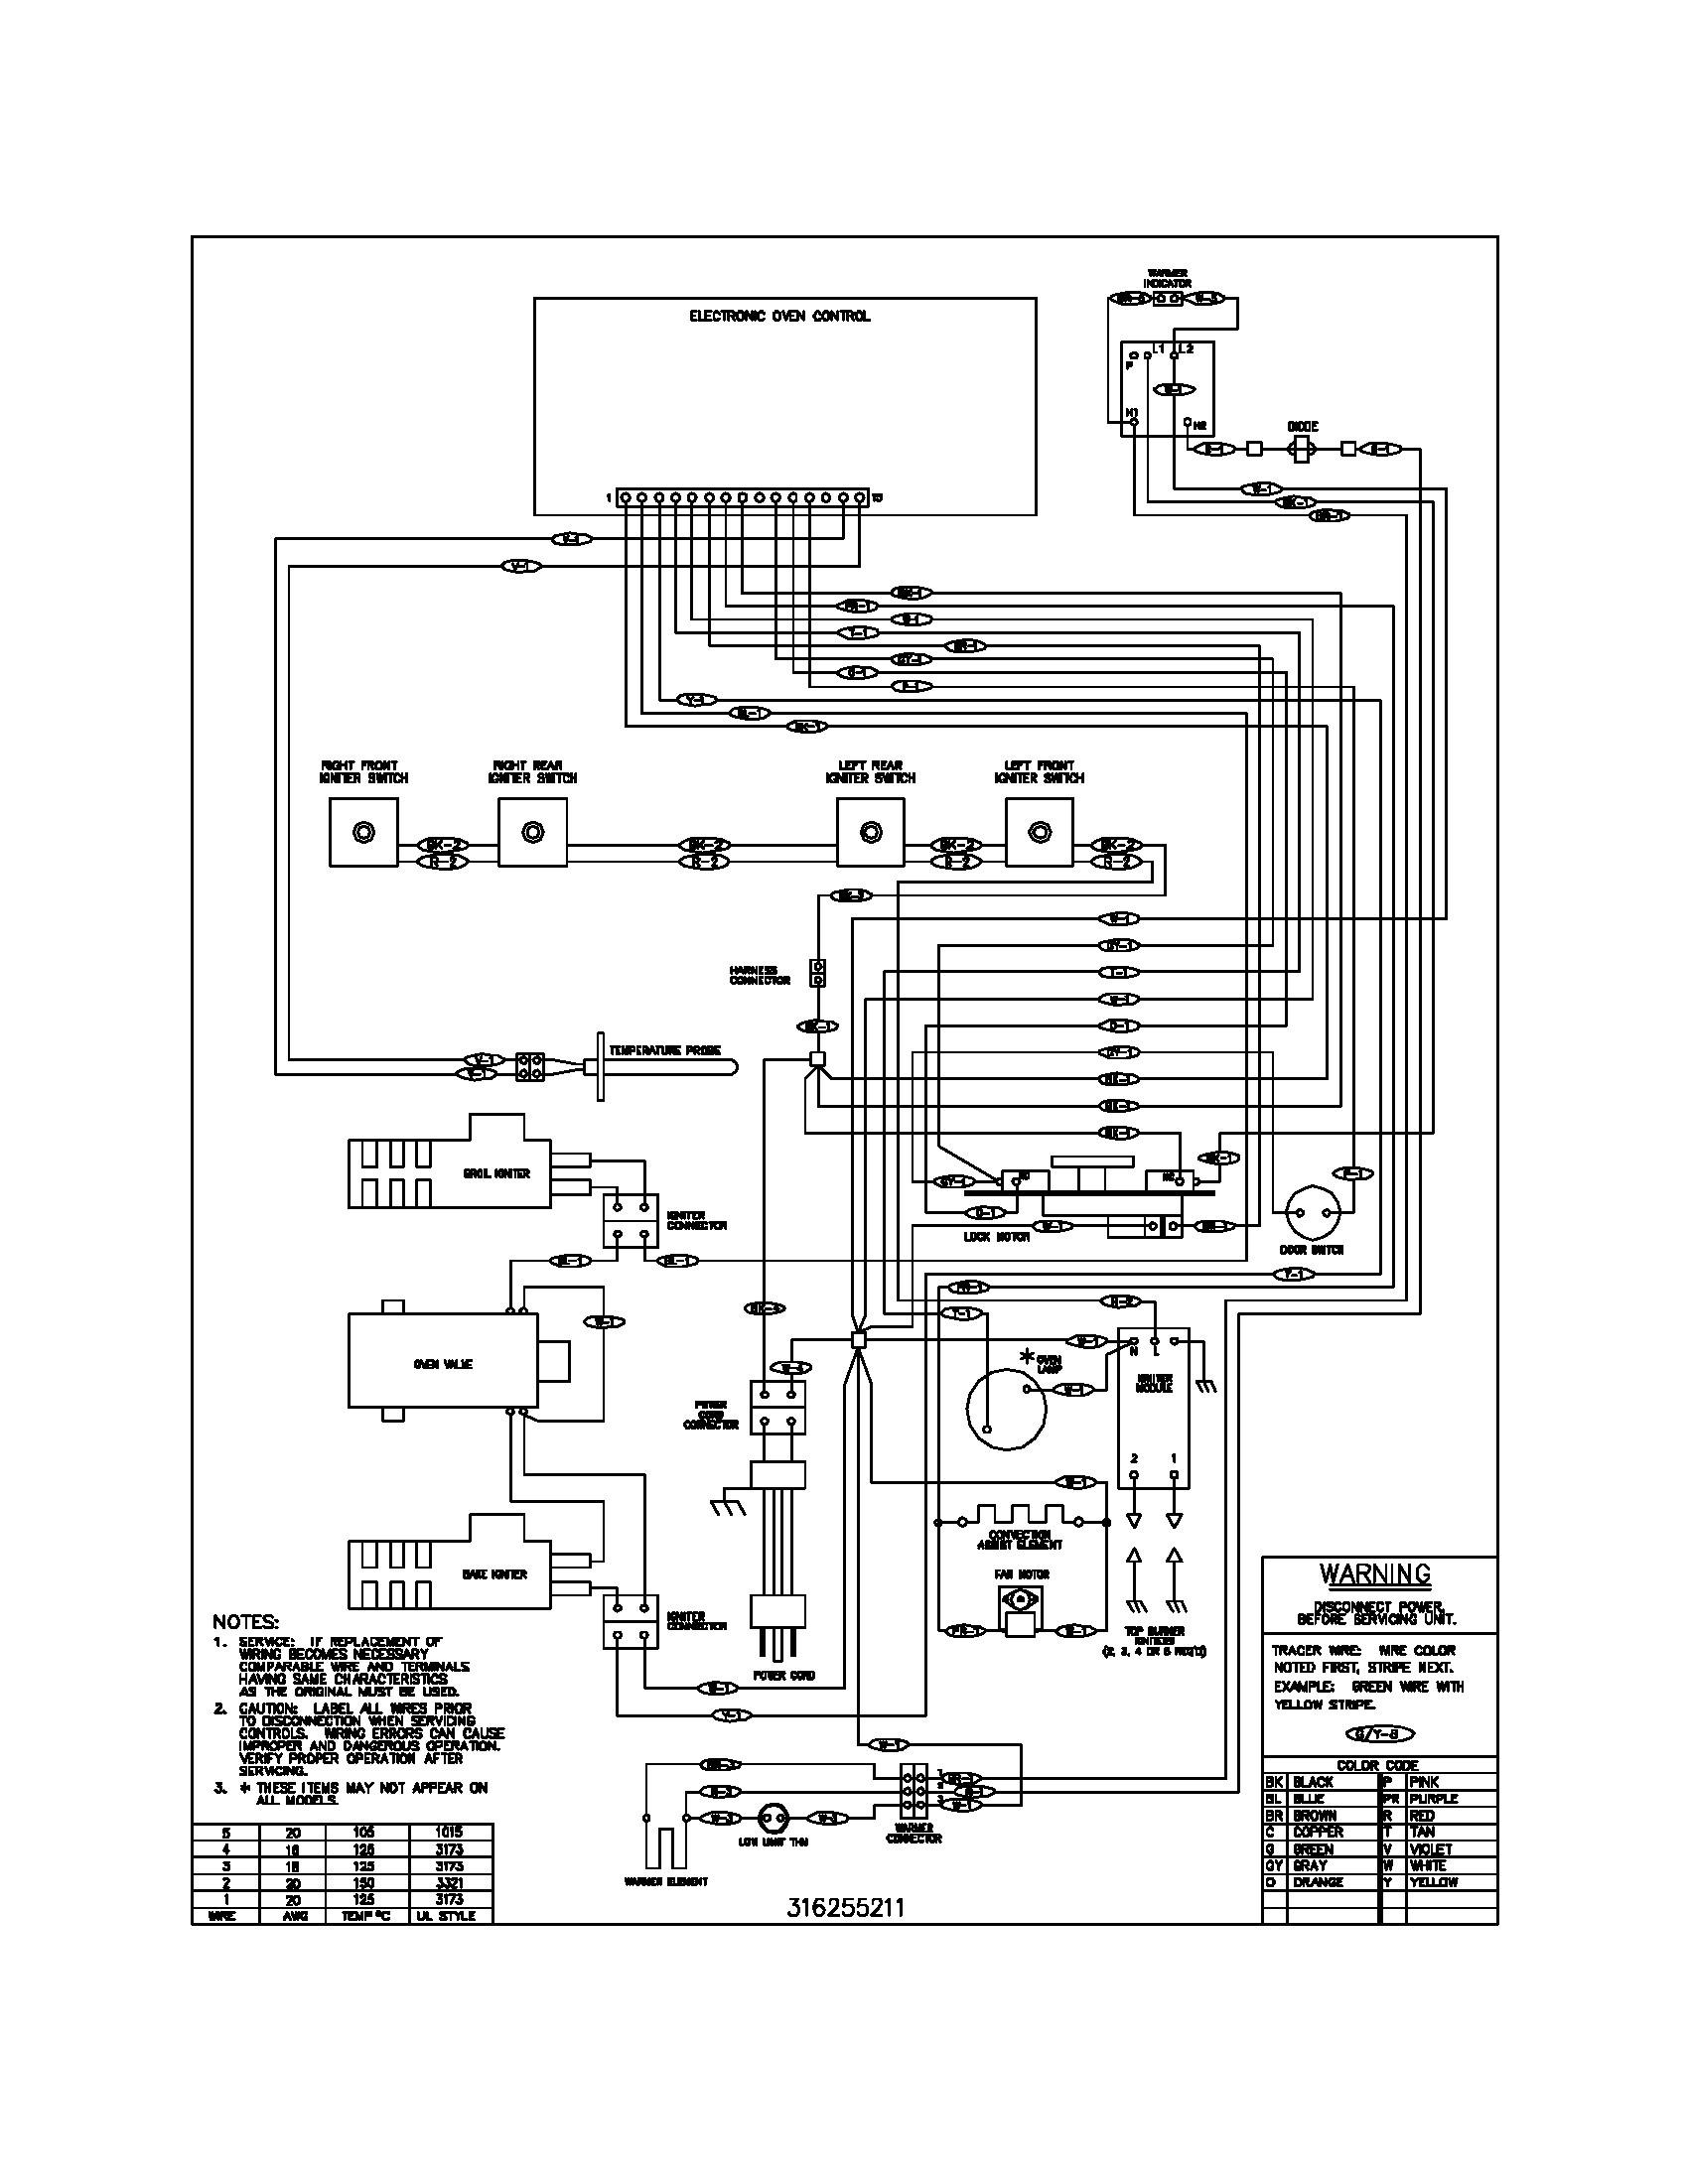 Ge Electric Furnace Wiring Diagram Fresh Ge Refrigerator Wiring Diagram Awesome Awesome Freezer Defrost Timer